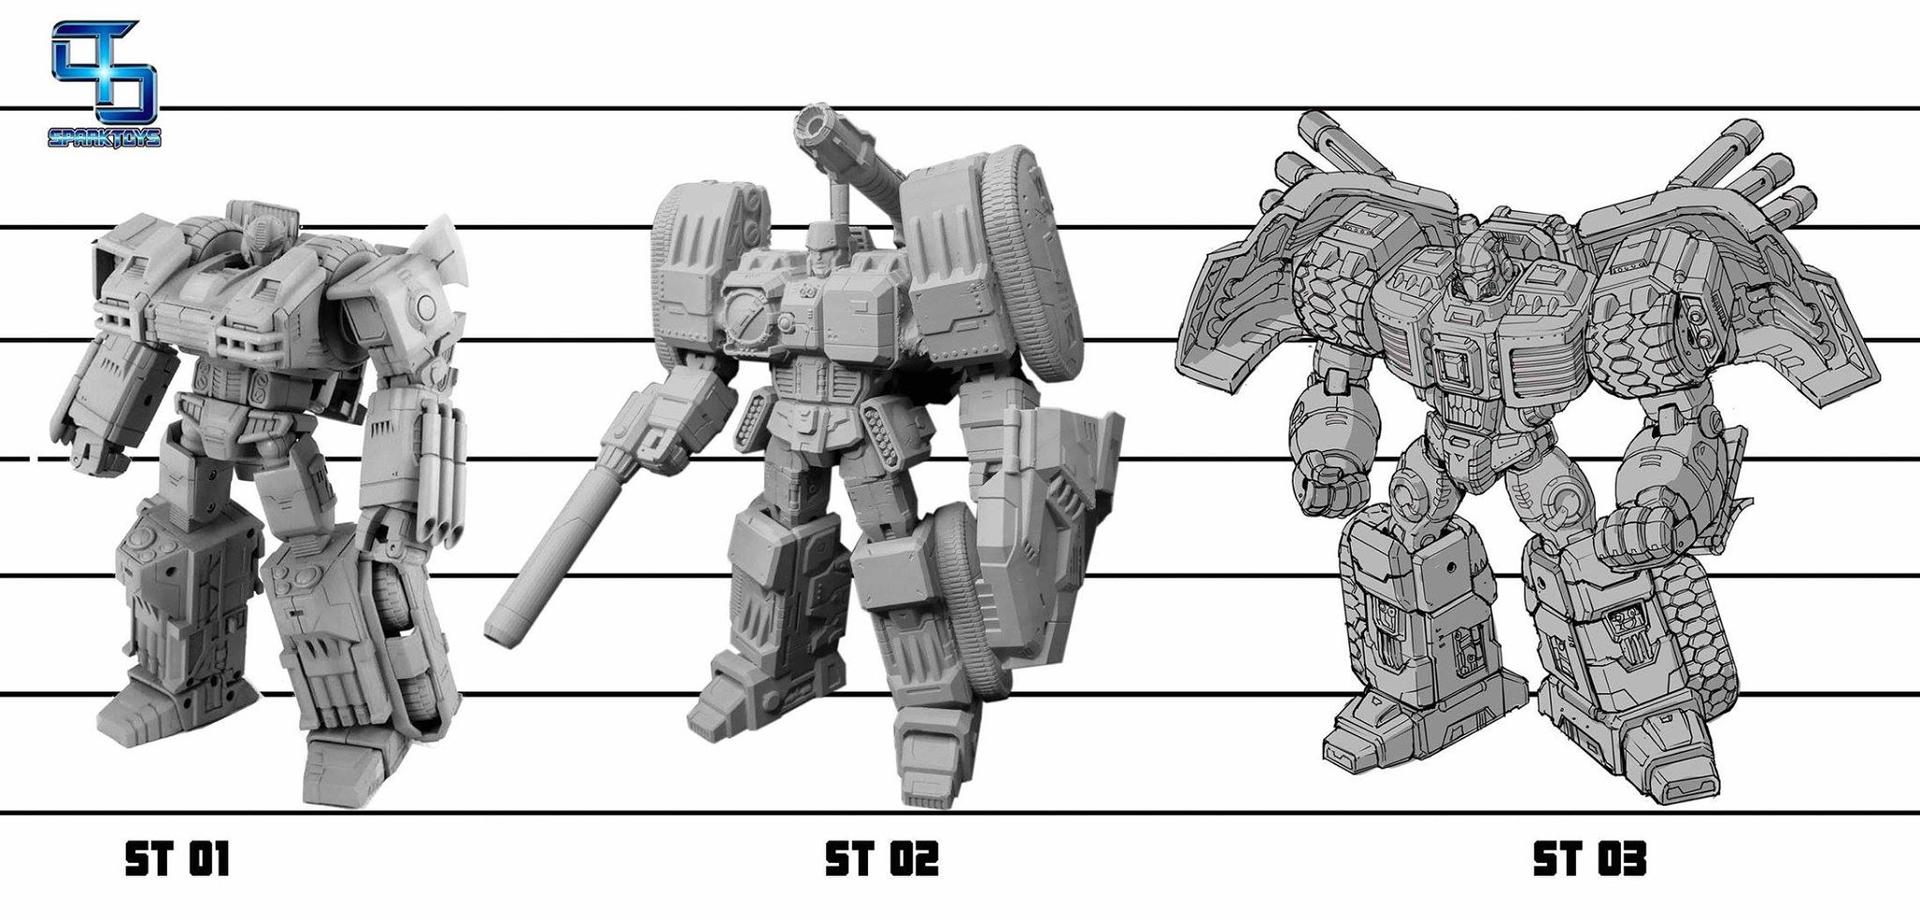 [SparkToys] Produit Tiers - ST - aka War Within: Optimus, Mégatron, Grimlock/La Menace, etc 12141045_862478970526446_1847159917501546444_o